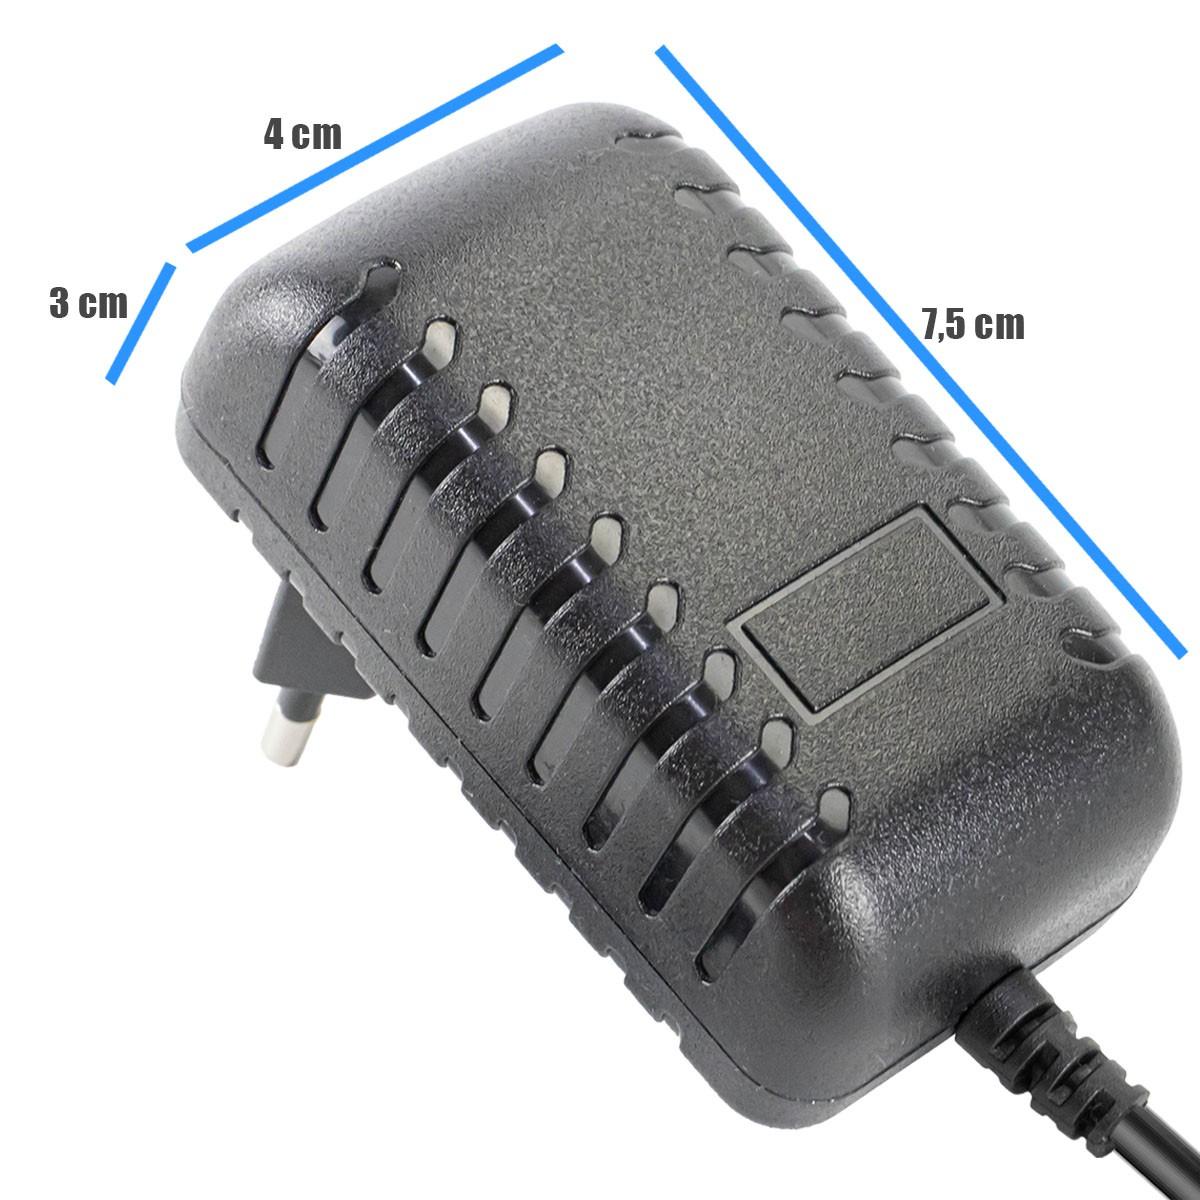 KIT 2x Fonte Chaveada 12v 3a Plug P4 5,5x2,5mm Bivolt LE-0174